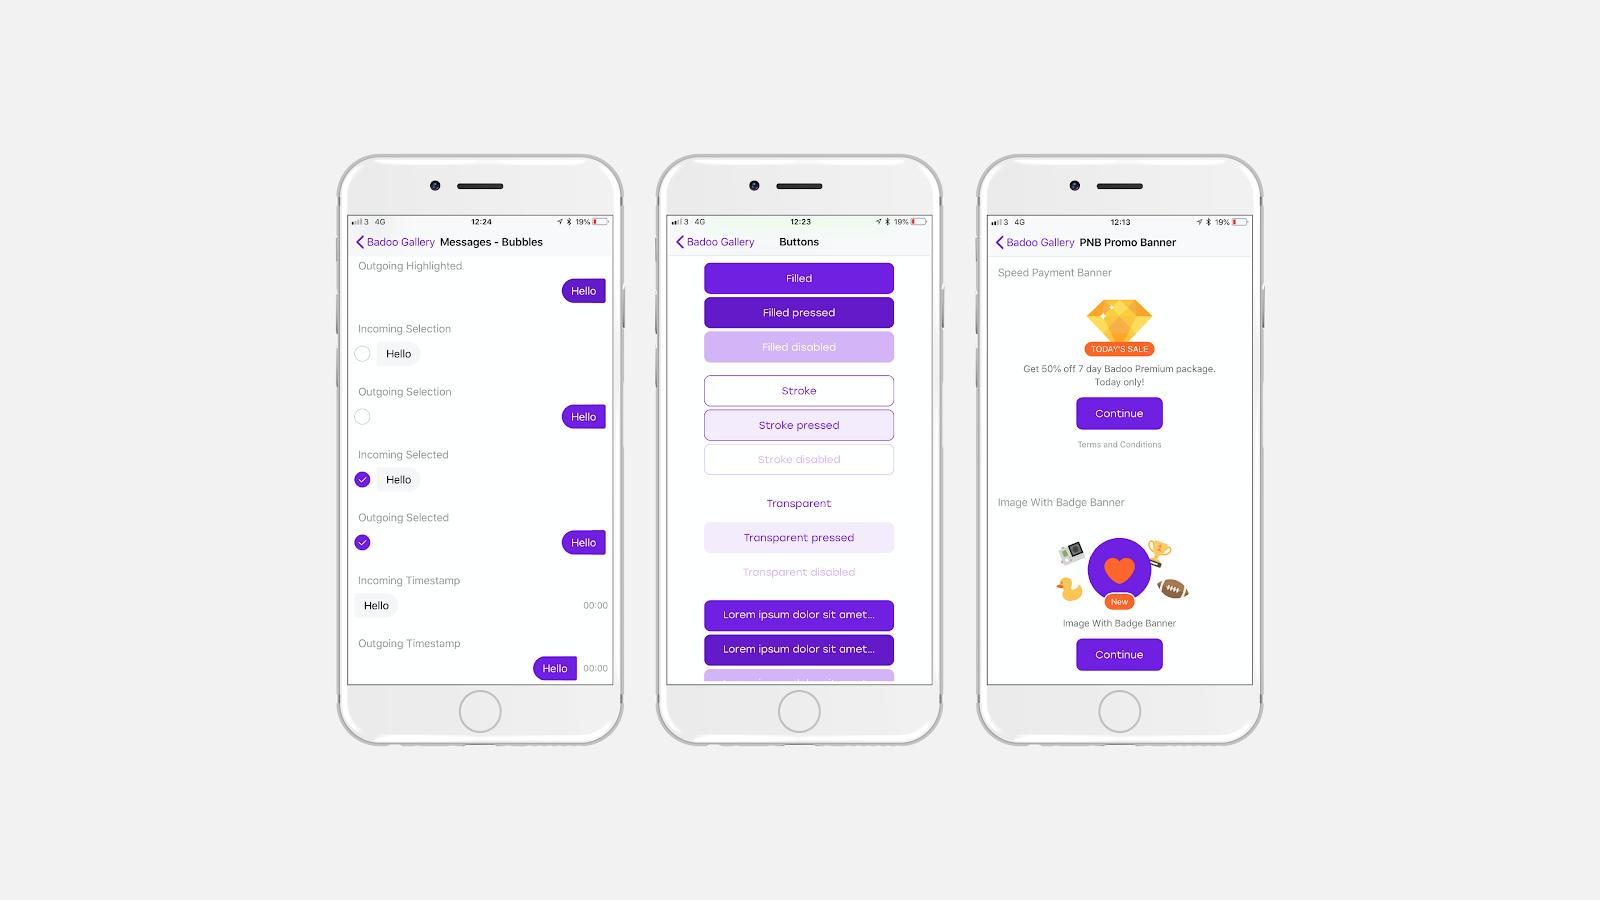 Реализуем UI в iOS: улучшаем, ускоряем, масштабируем - 10